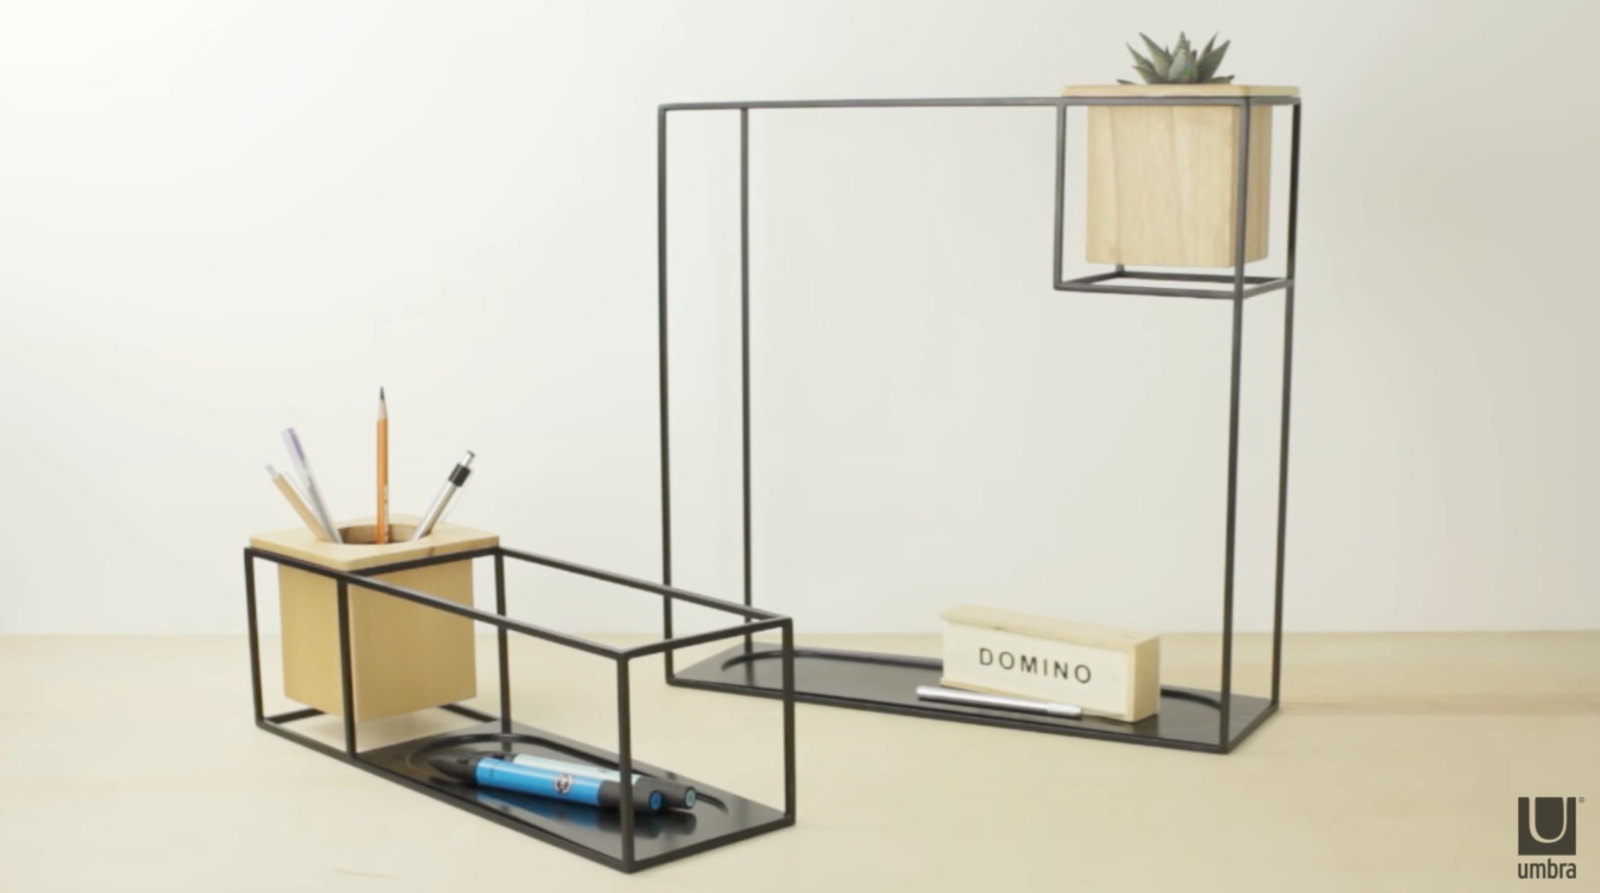 Umbra Cubist Wandrek : Interior tip wall shelf cubist large black umbra axeswar